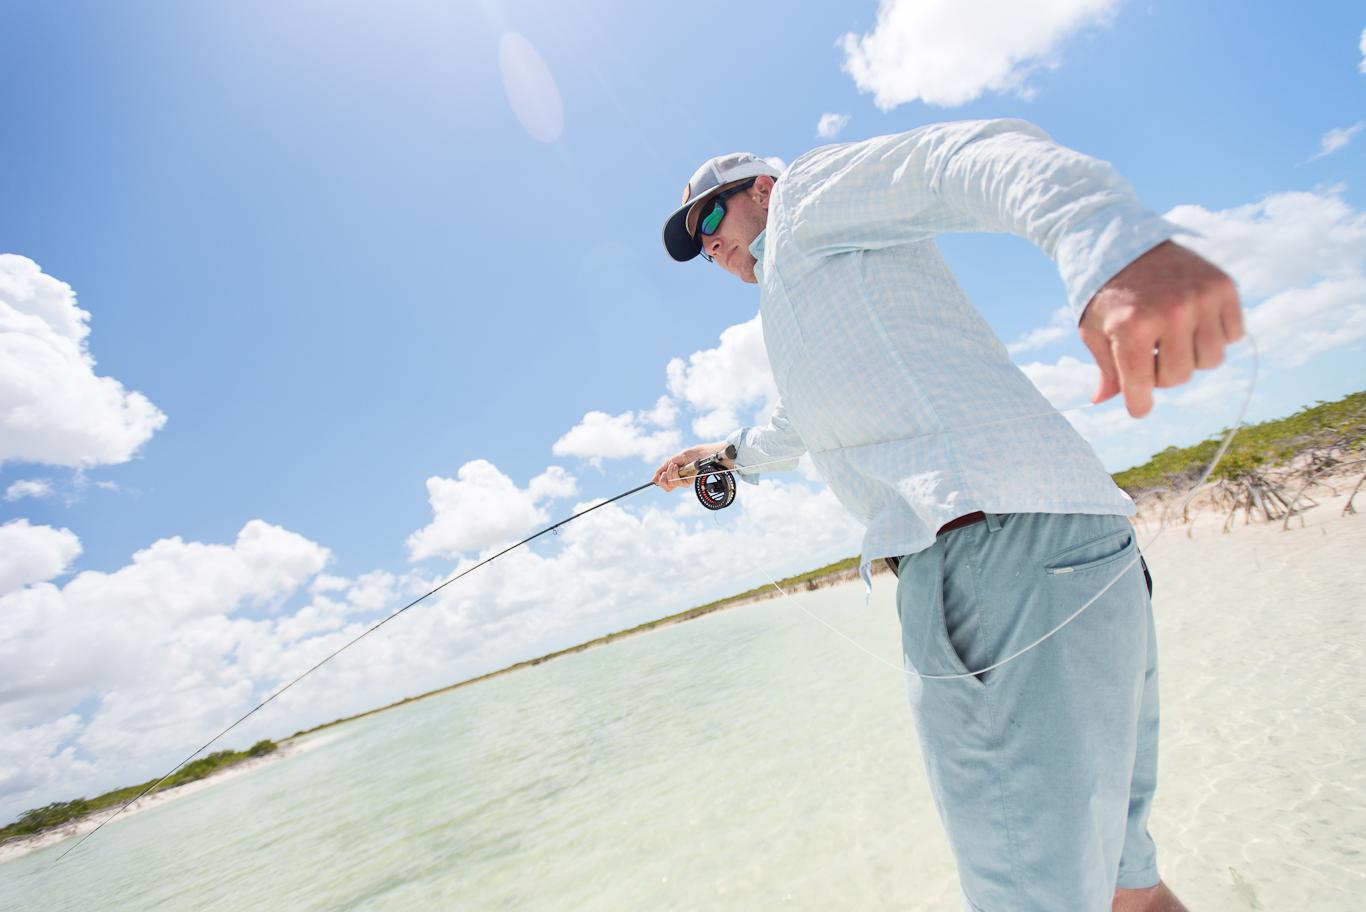 Bahamas, South Andros, Flyfishing, Bonefish